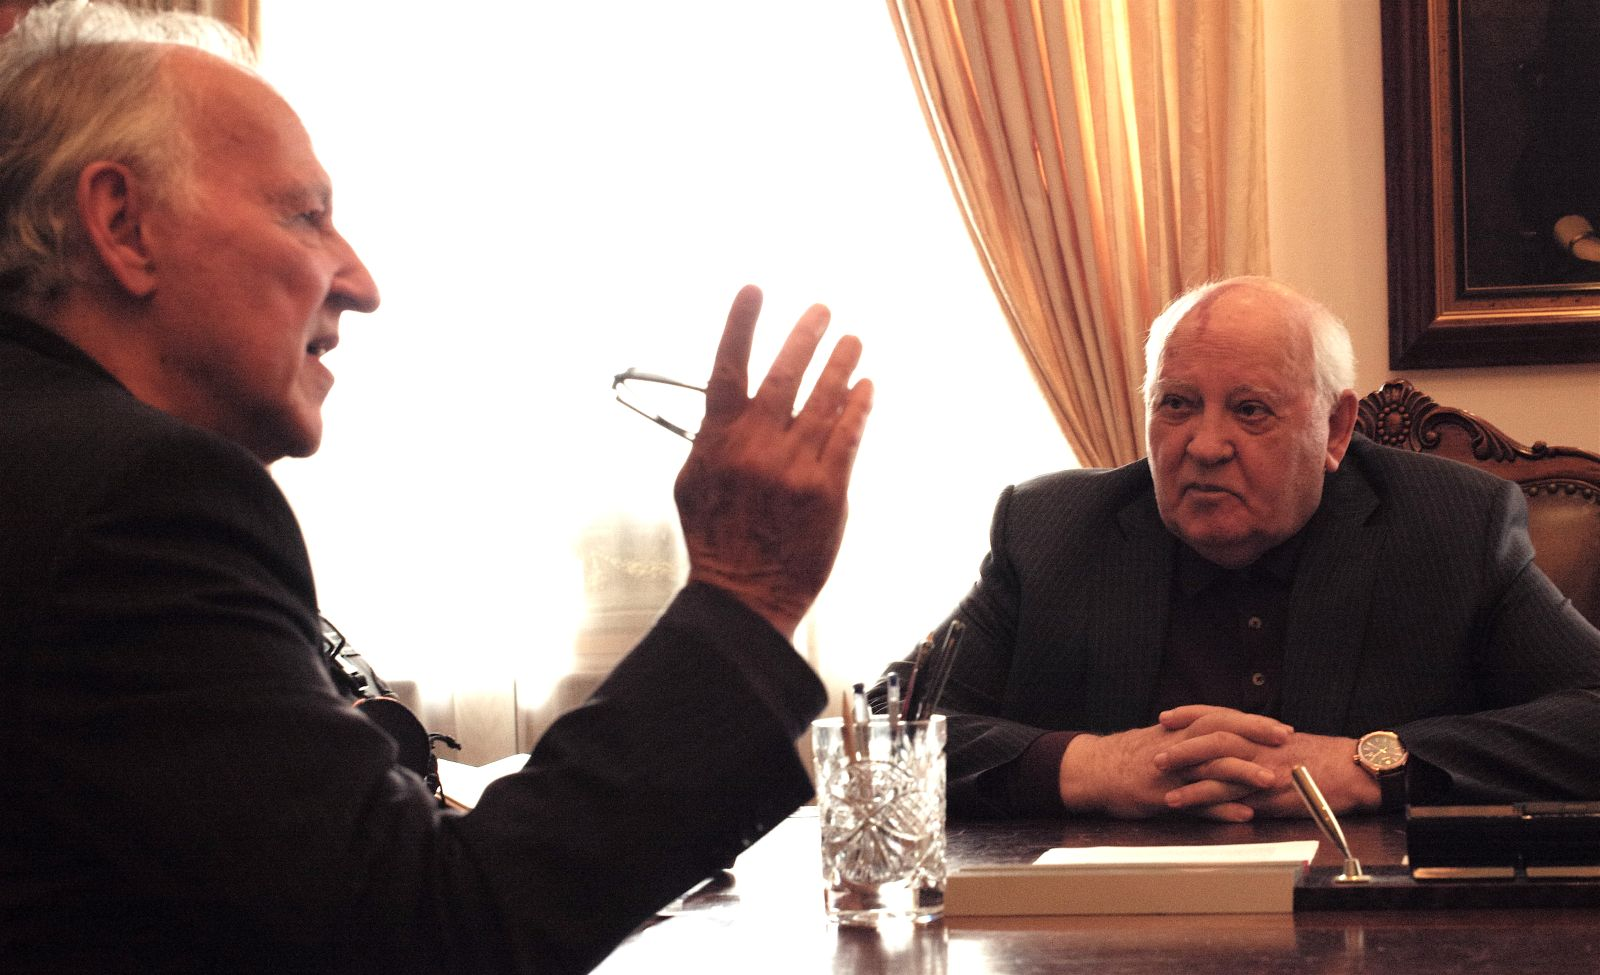 Herzog Incontra Gorbaciov 0